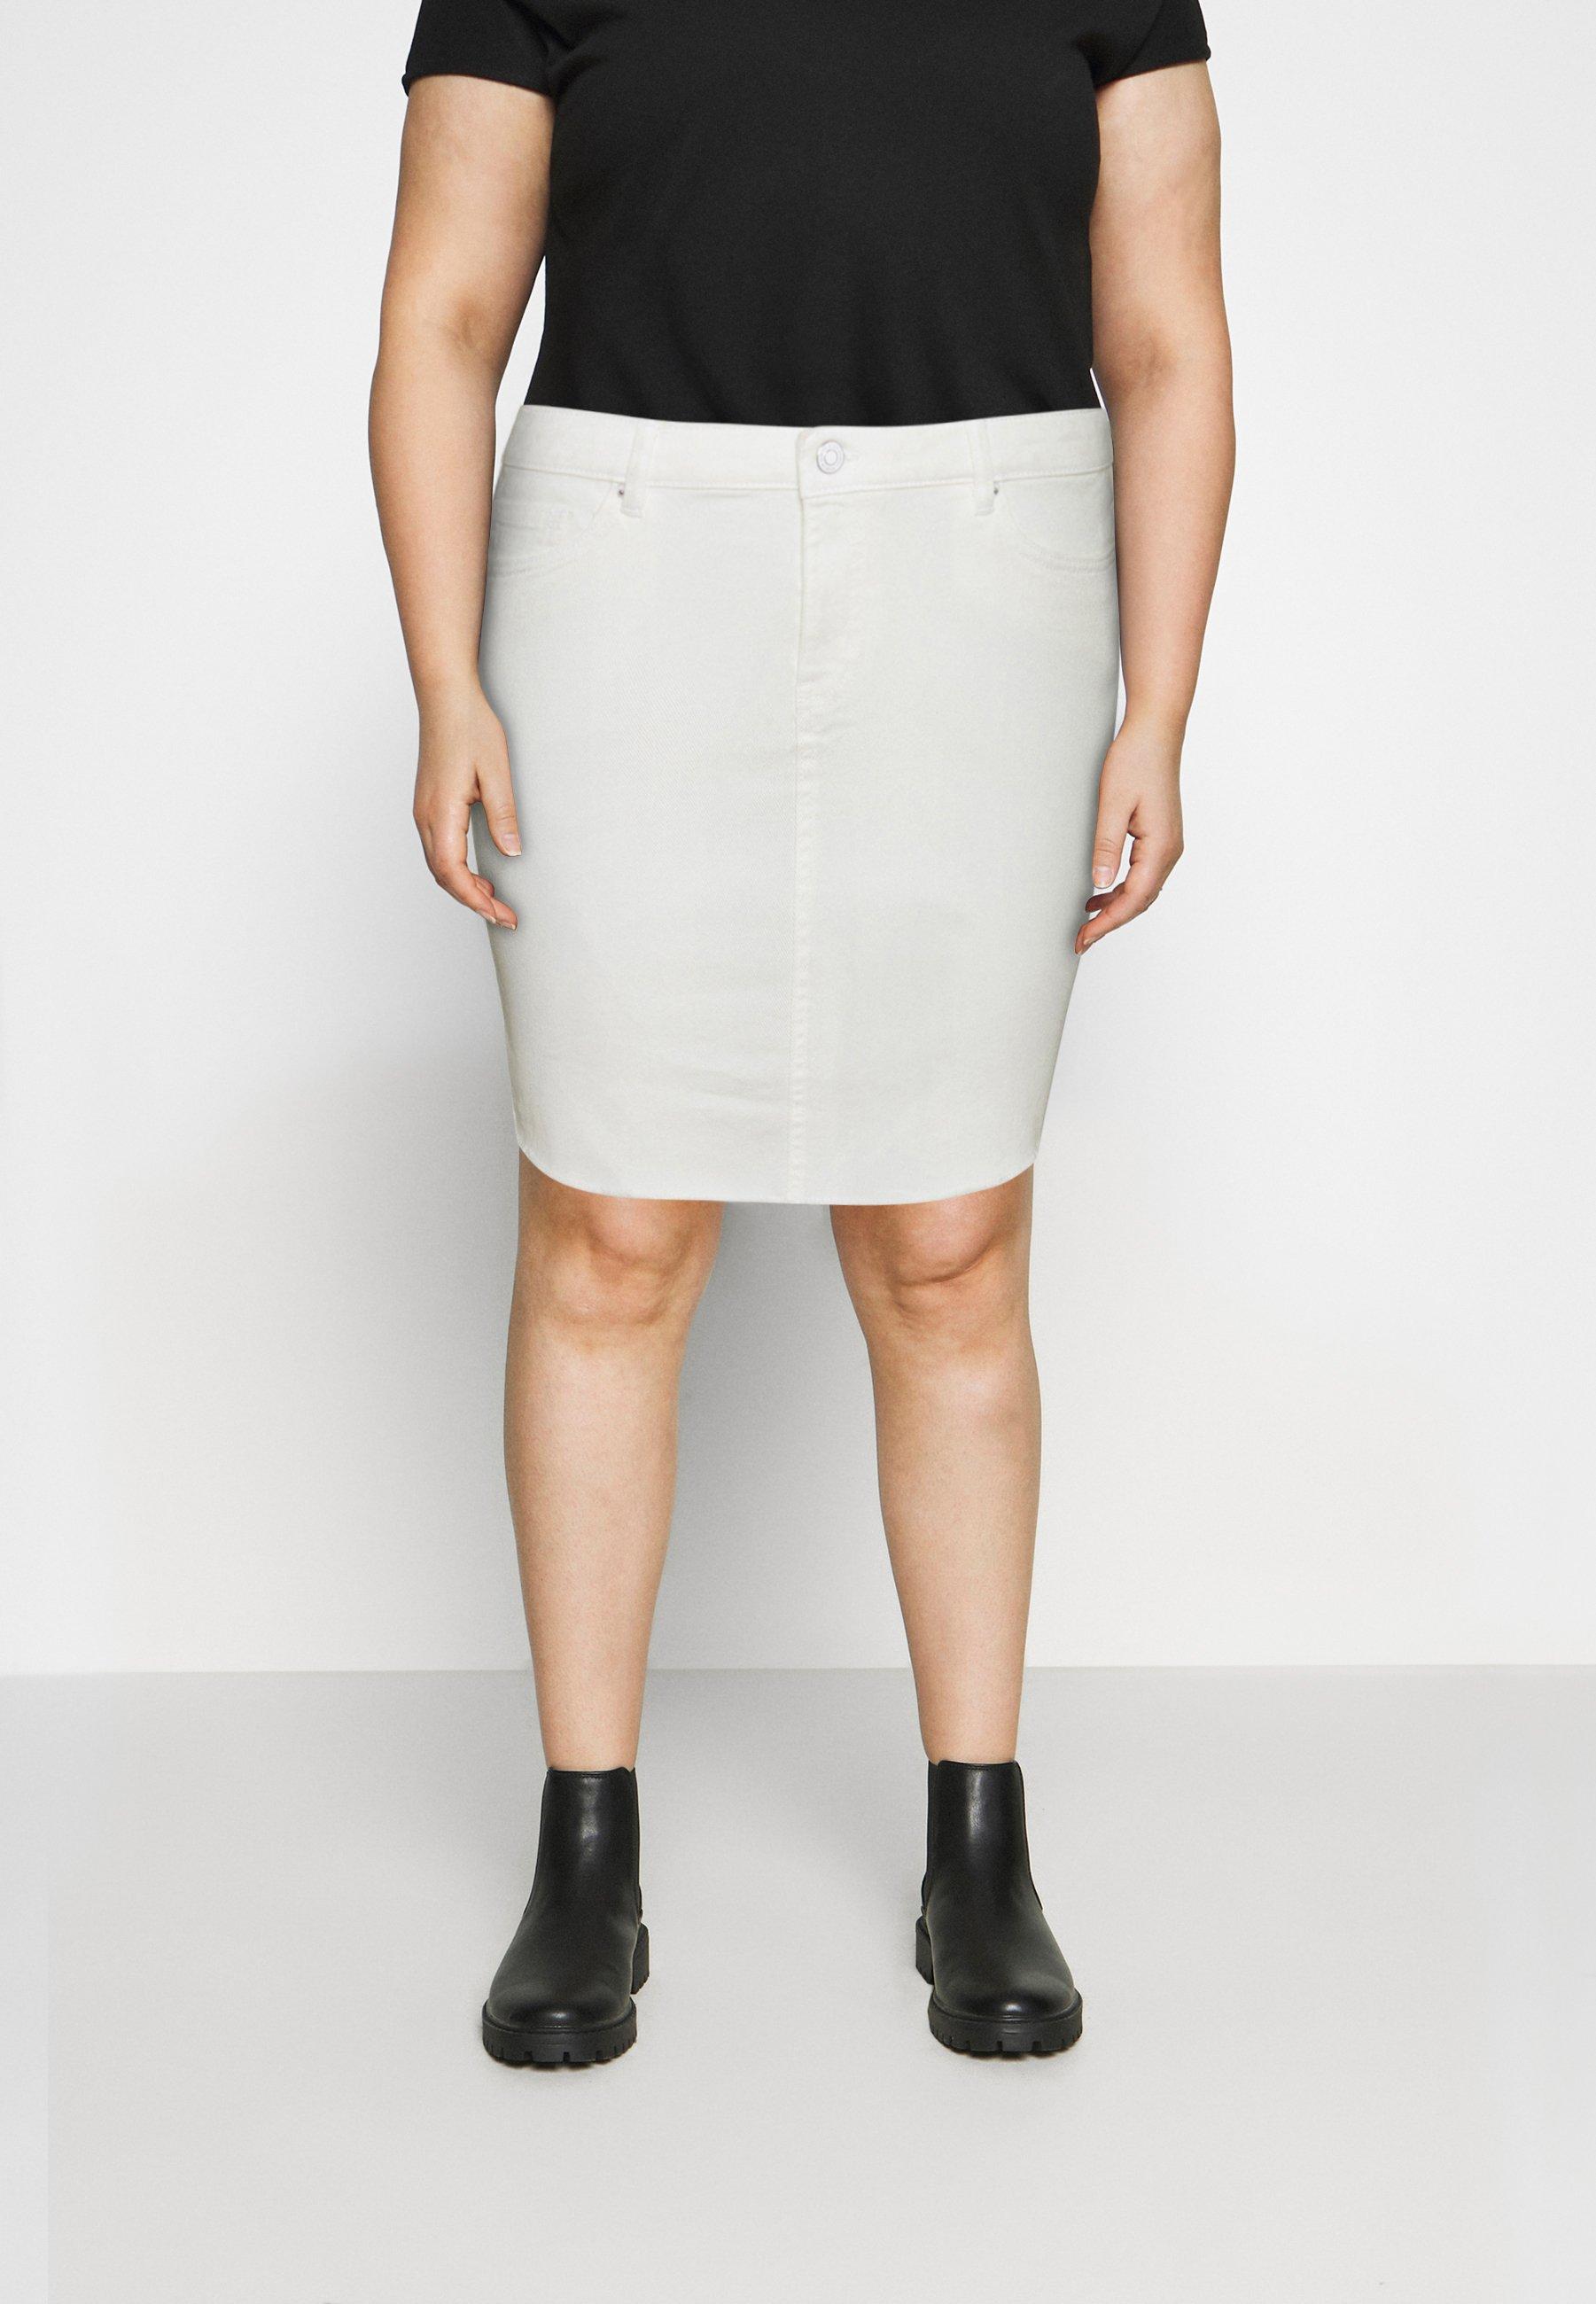 Femme VMFAITH SHORT SKIRT MIX - Minijupe